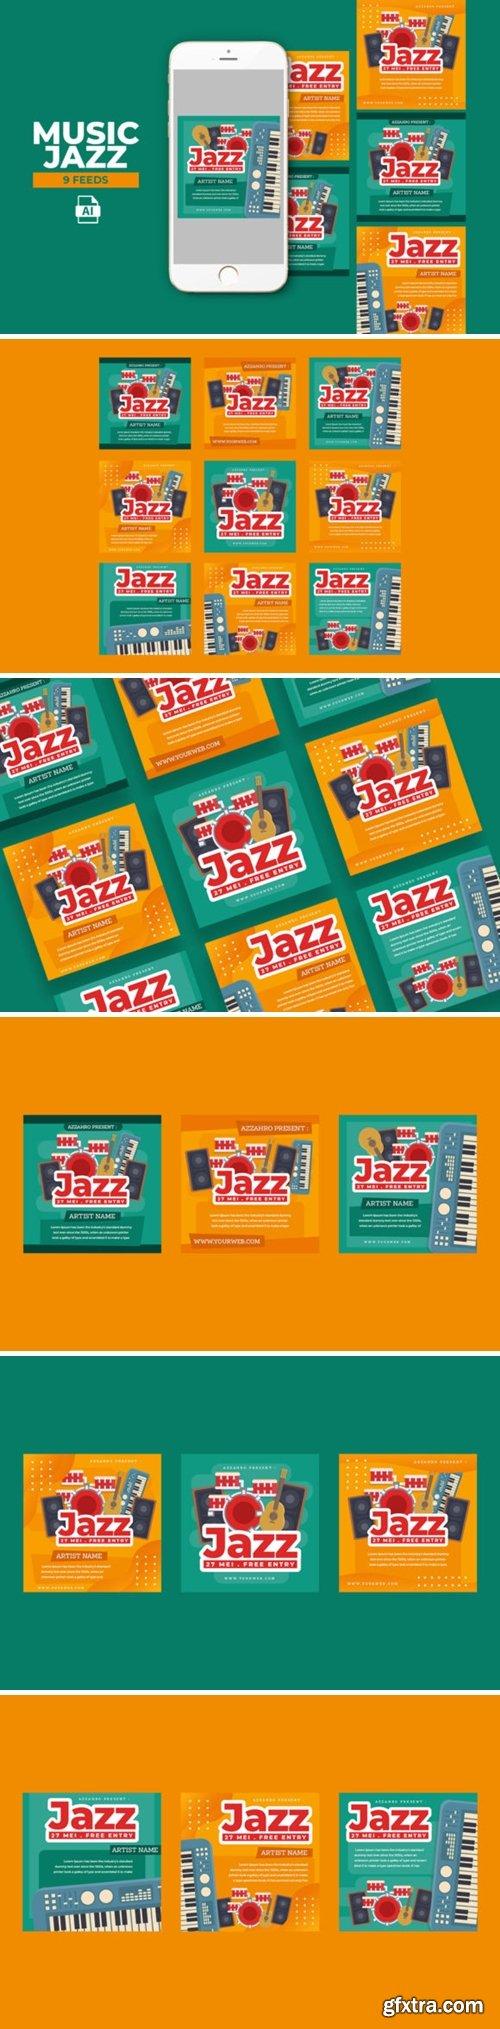 Music Jazz Instagram Templates 2013549